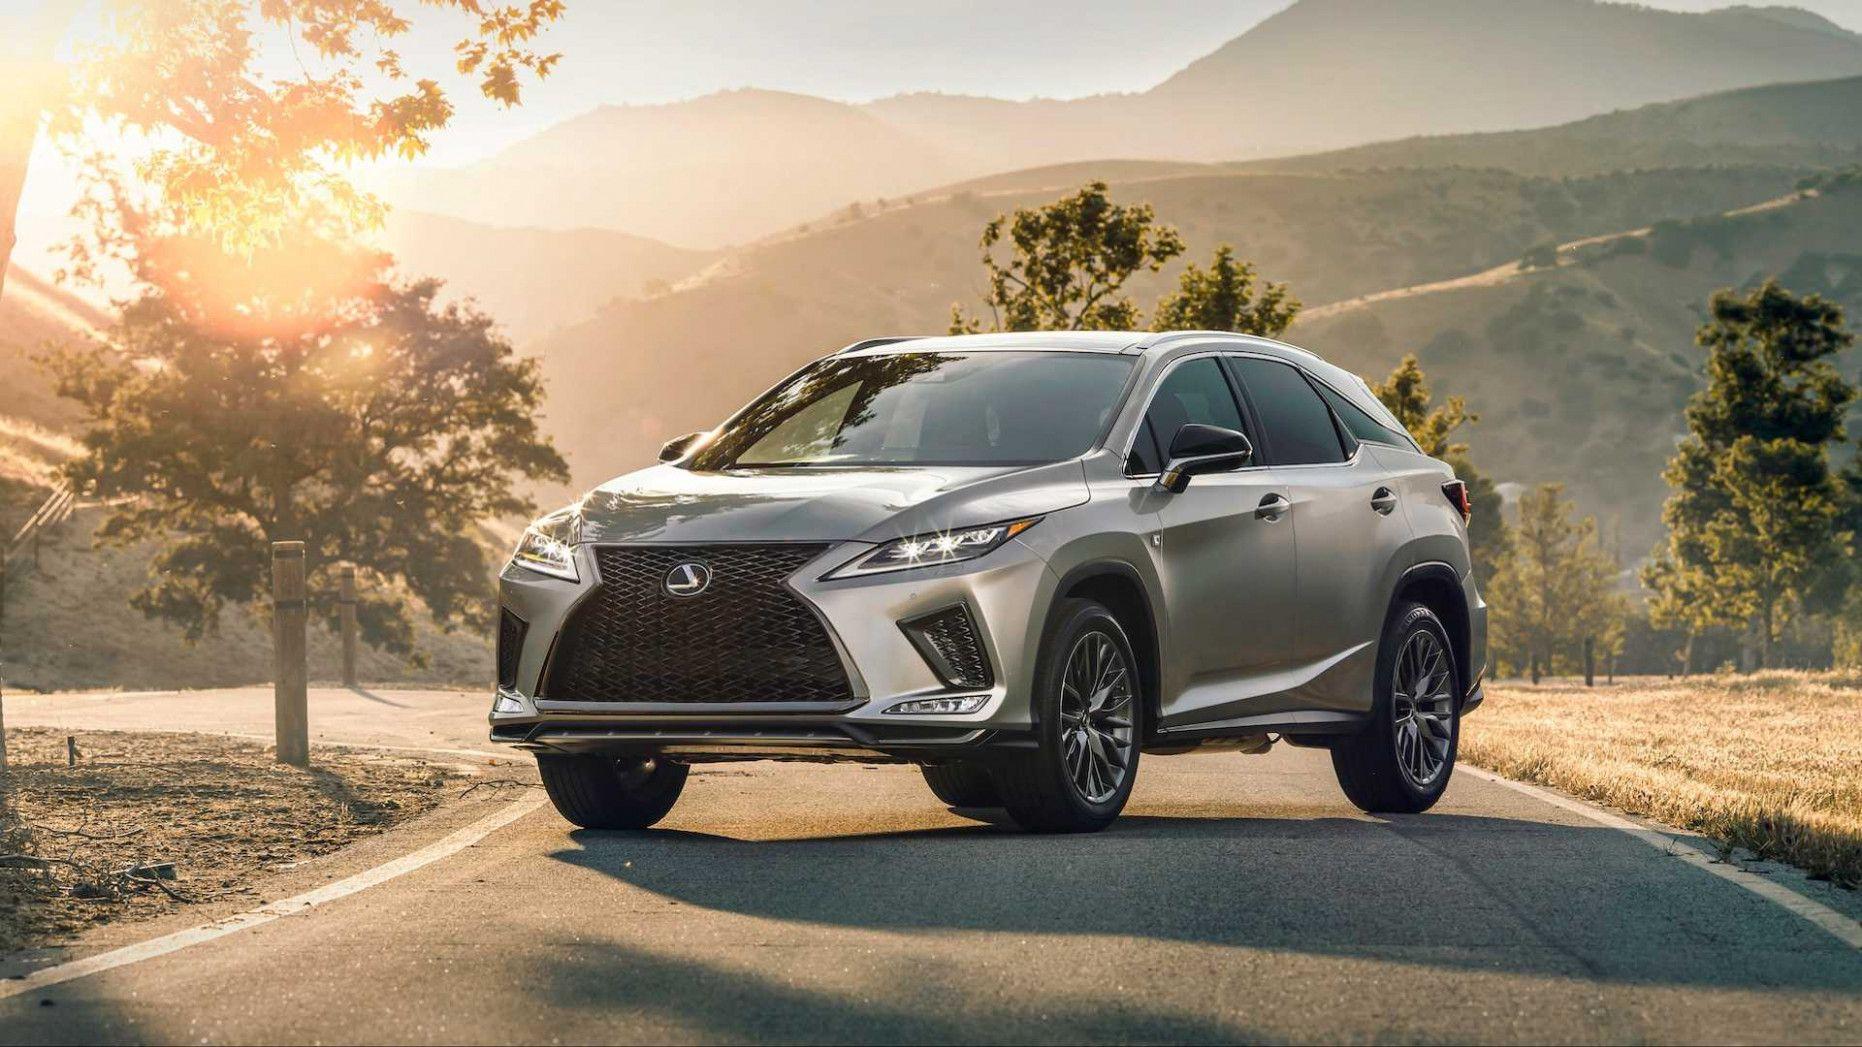 7 Brilliant Ways To Advertise Lexus Rx 2020 Lexus Rx 350 Lexus Suv Suv Reviews